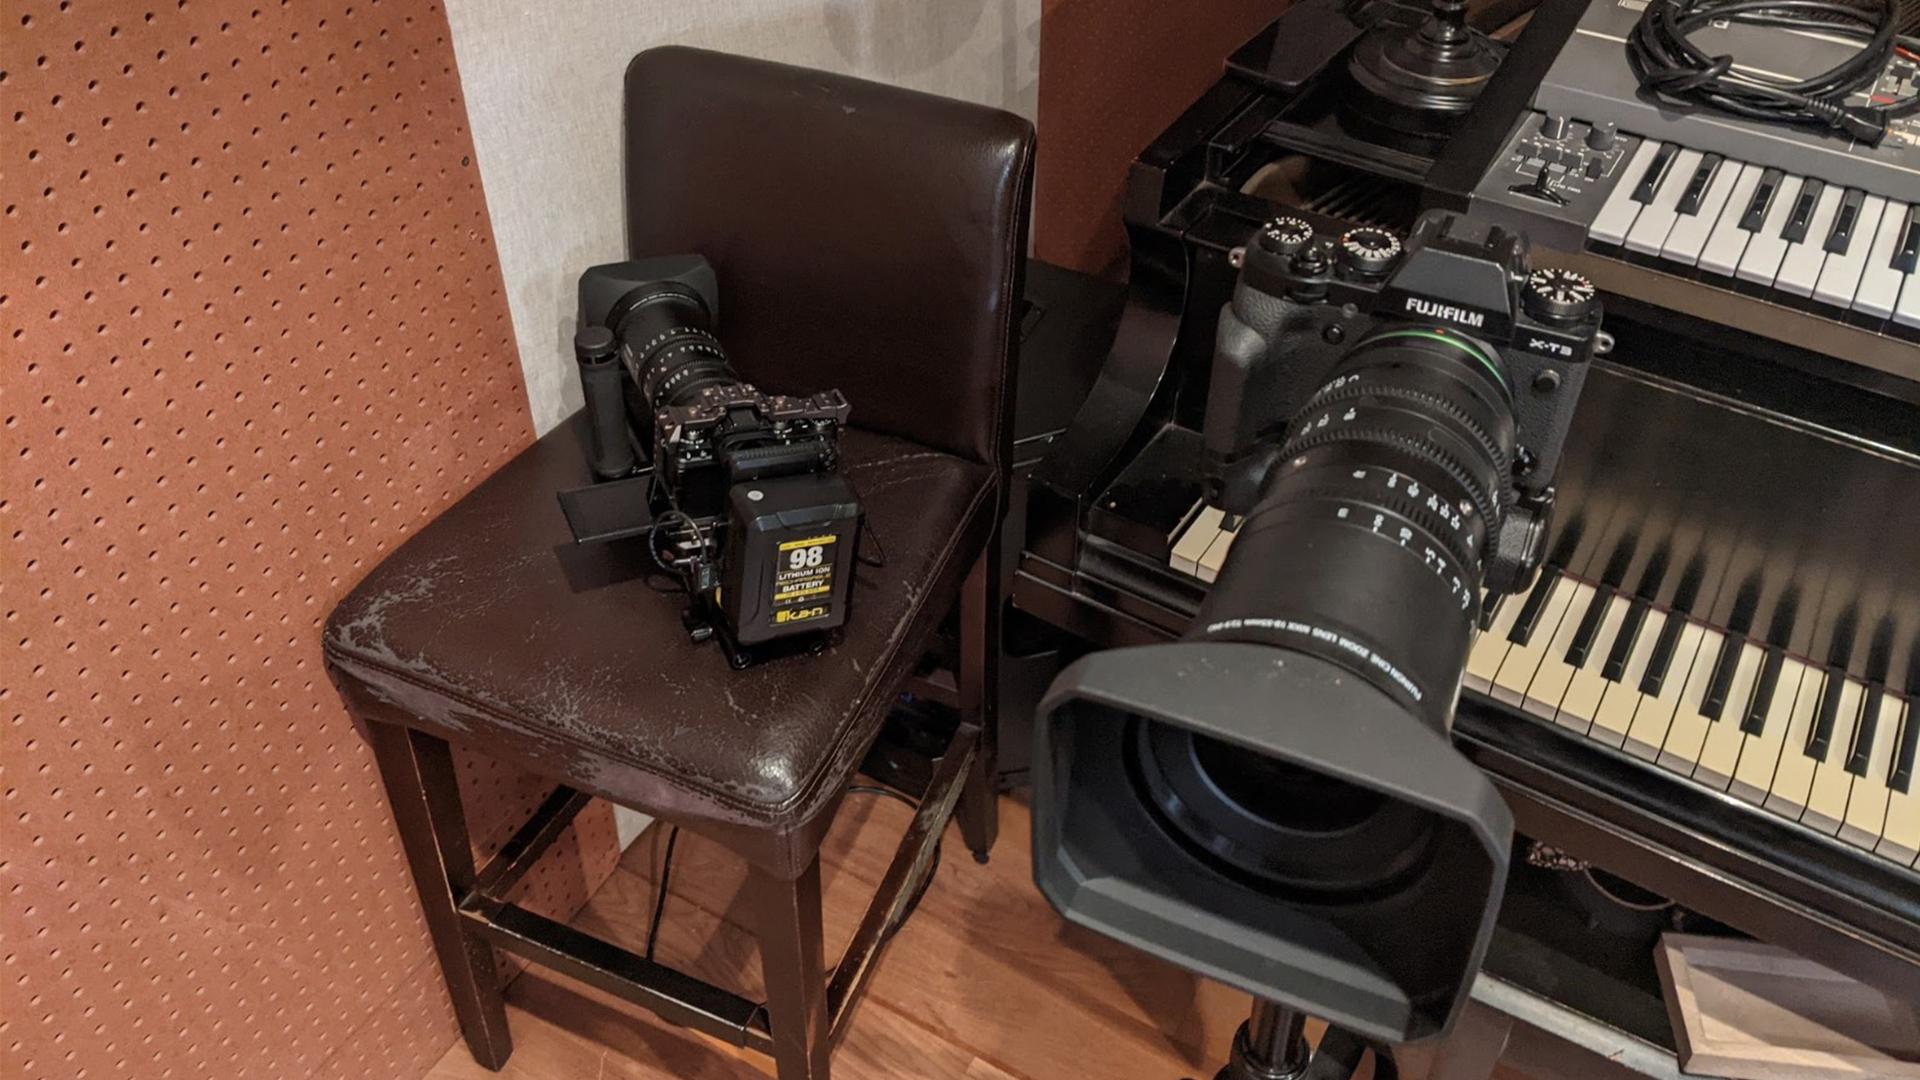 Cinema Capabilities of Fujifilm Cameras 32